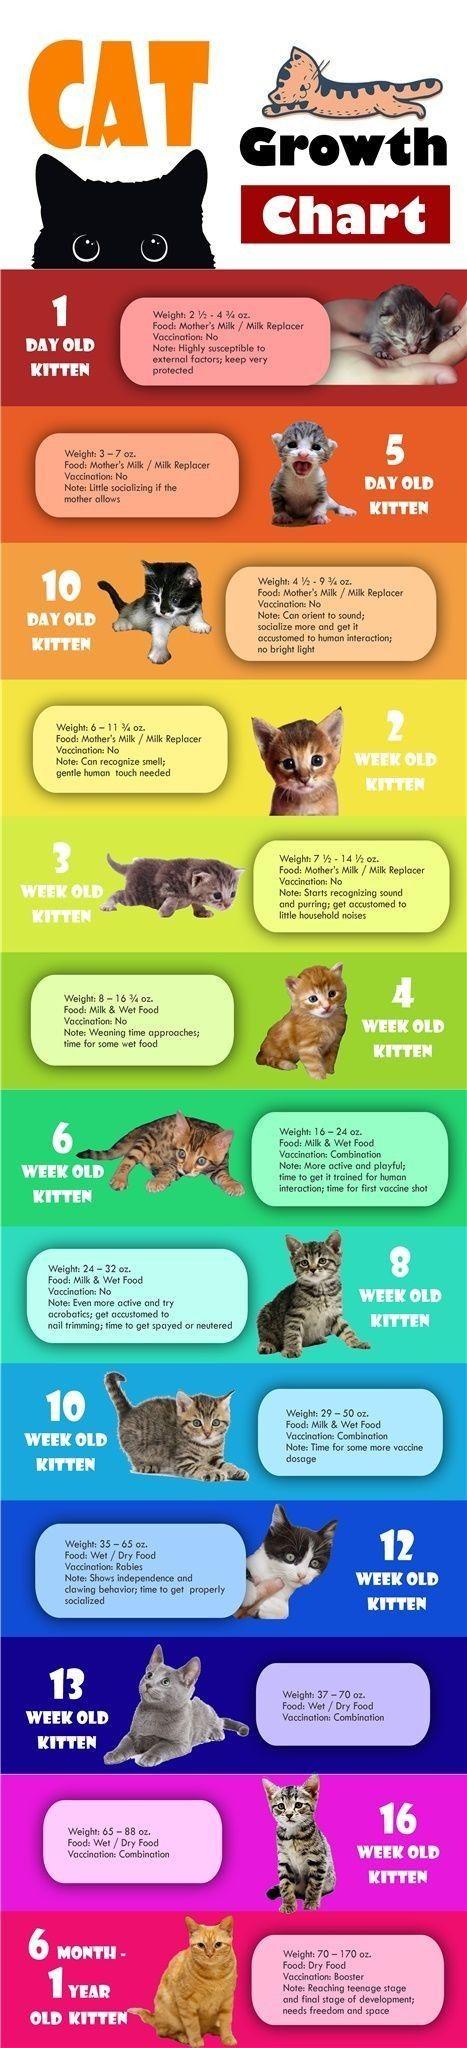 Kitten Growth Development In 2020 Cat Infographic Kitten Care Kitten